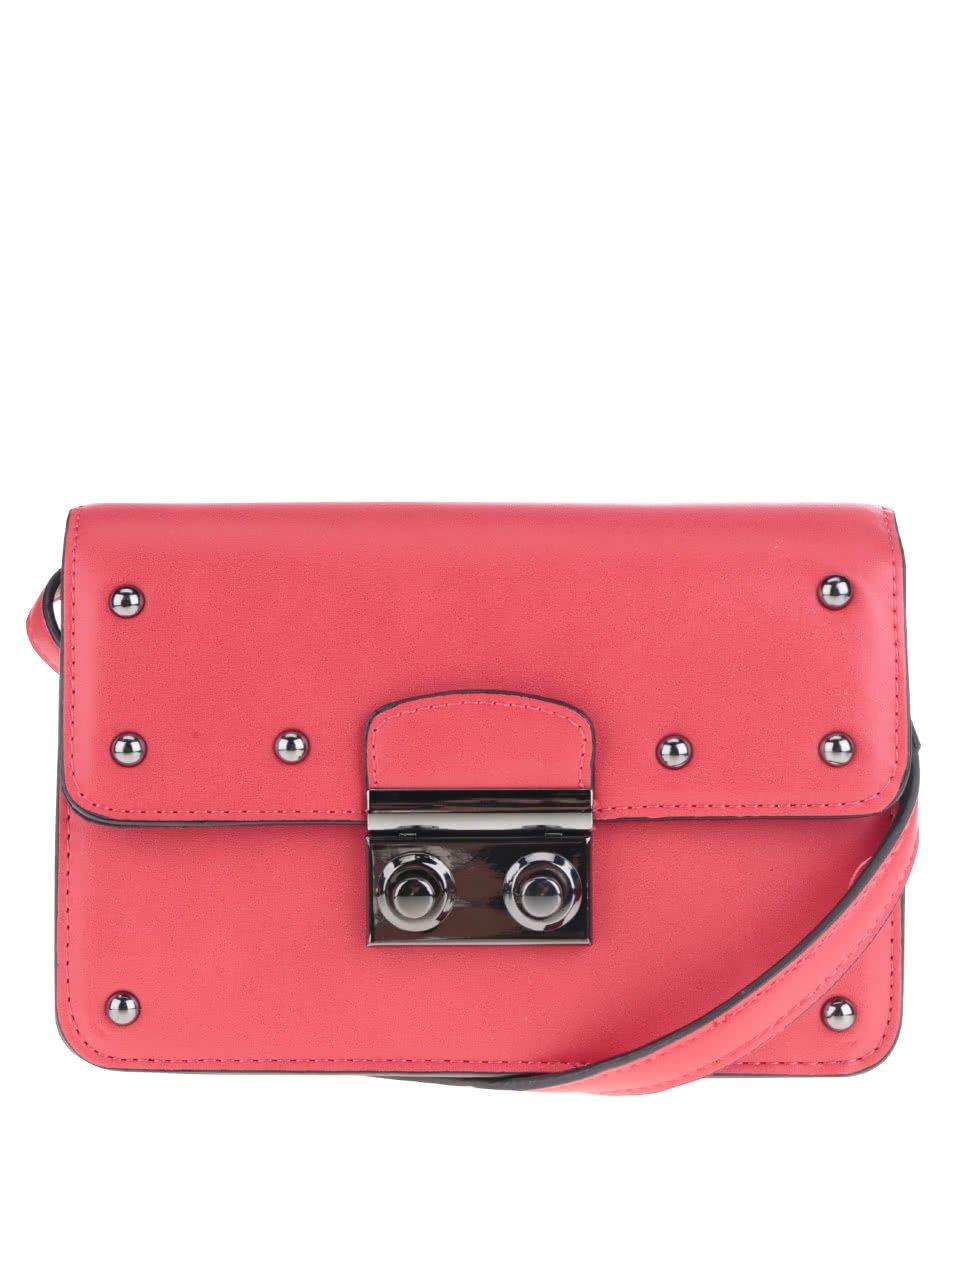 Červená crossbody kabelka s cvočky Pieces Helene